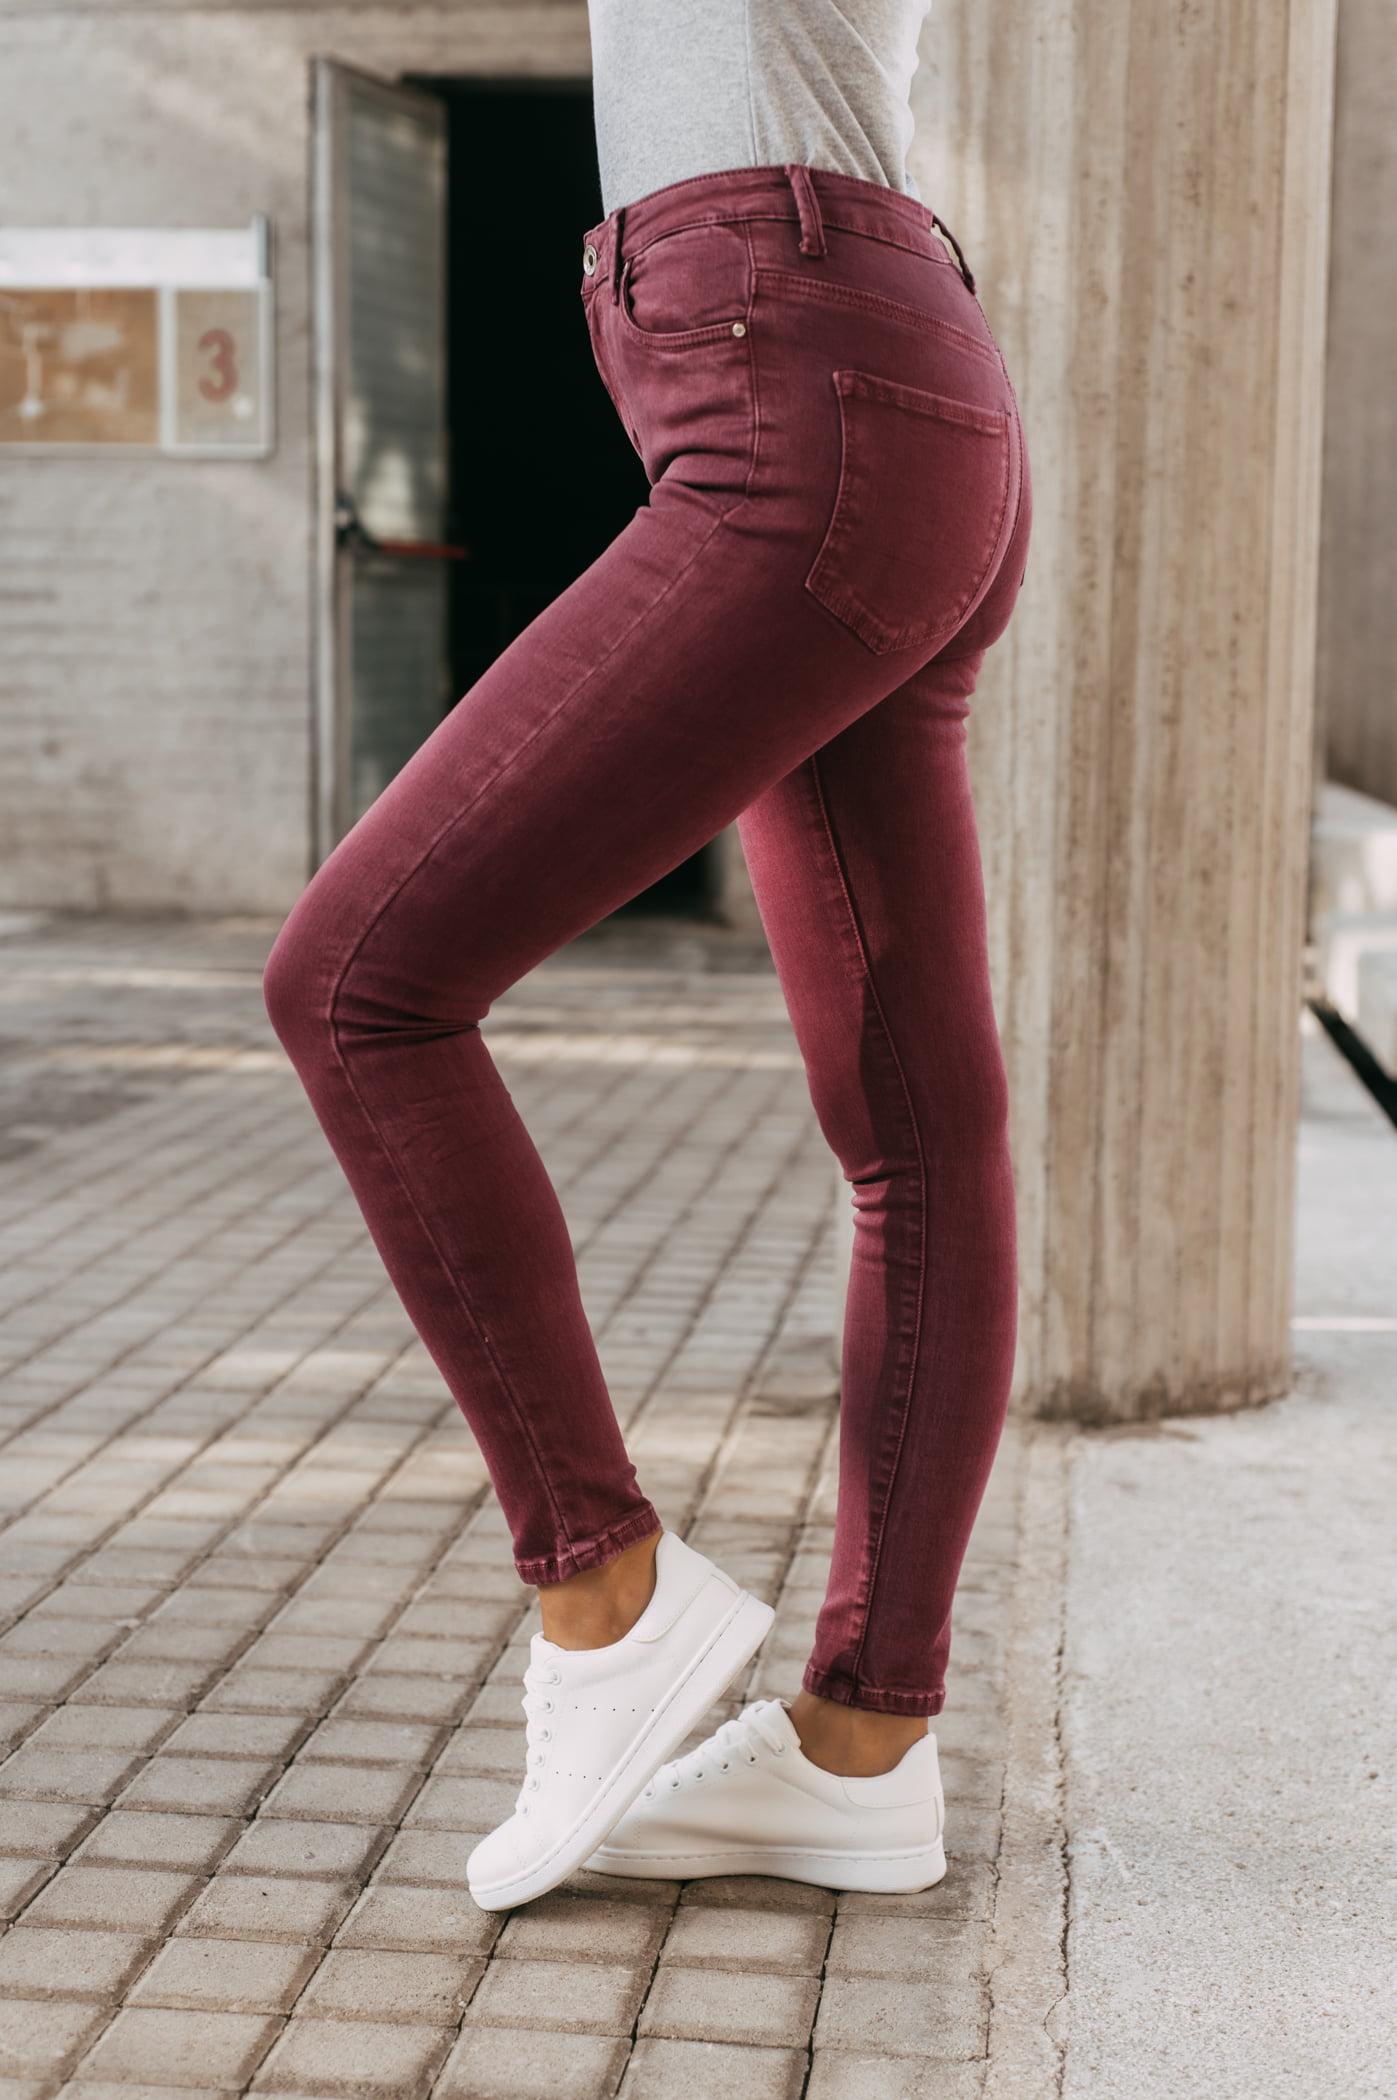 antithesis-clothing-jean-panteloni-mpornto (4)